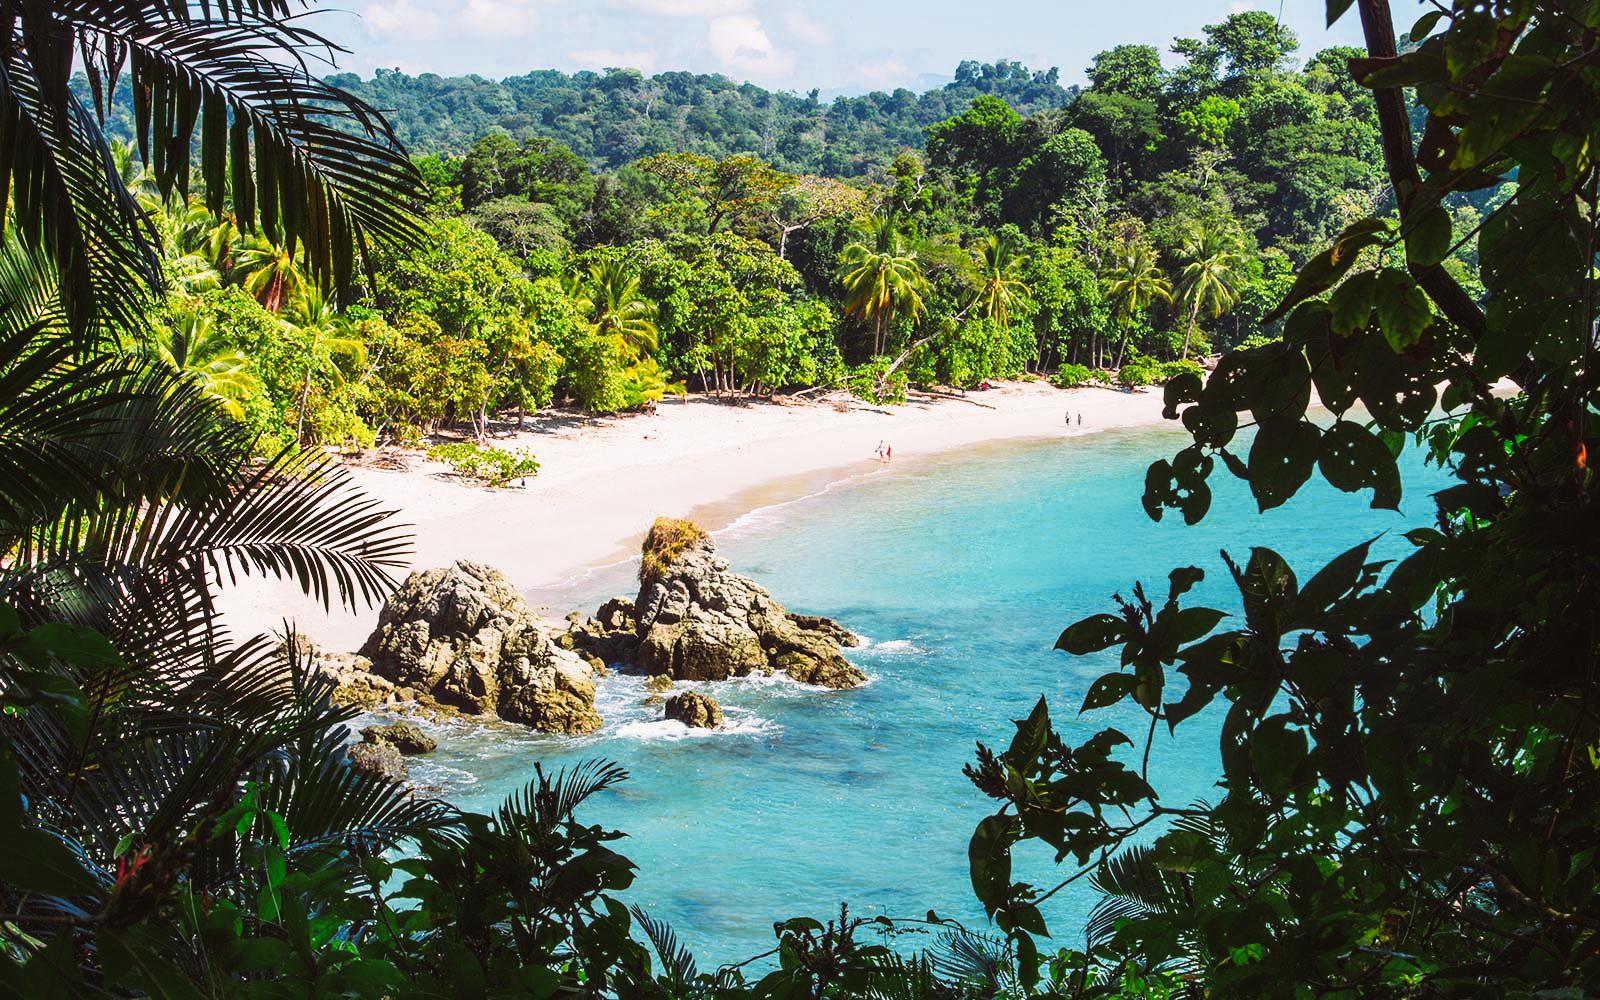 manuel-antonio-beach-costa-rica-CRFLIGHTDEAL1017-1.jpg